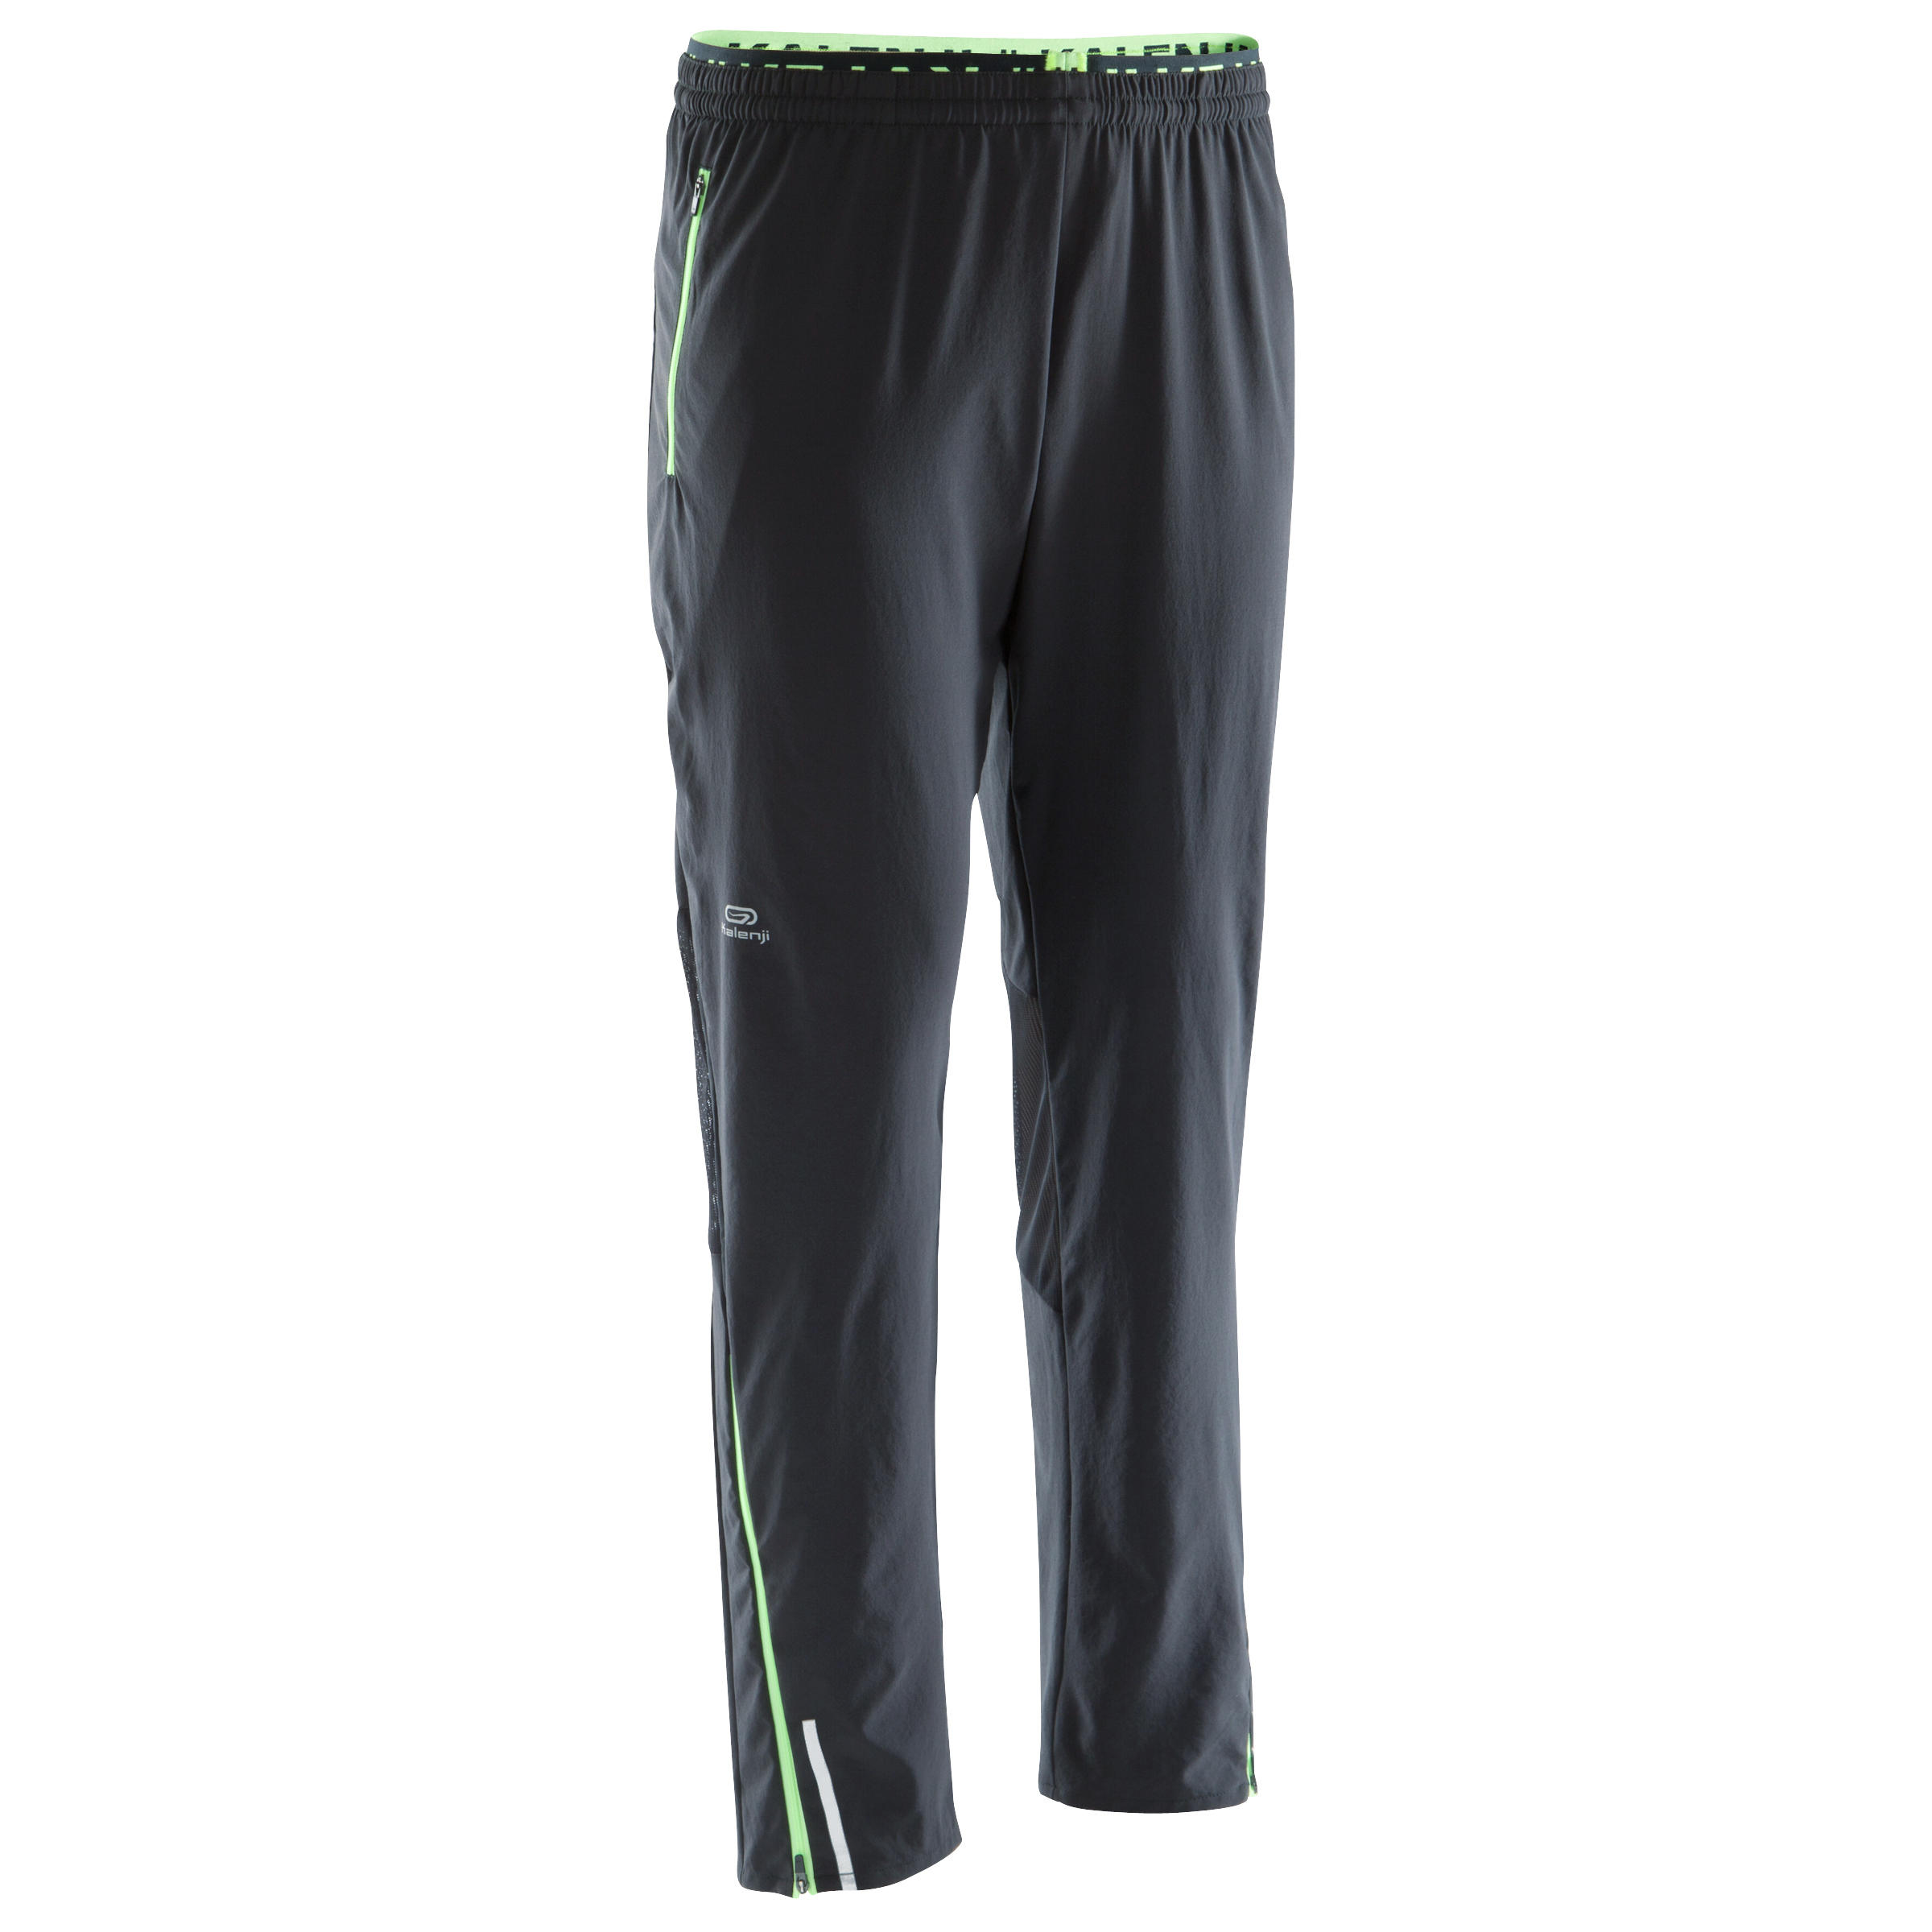 Kiprun Men's Running Pants - Black